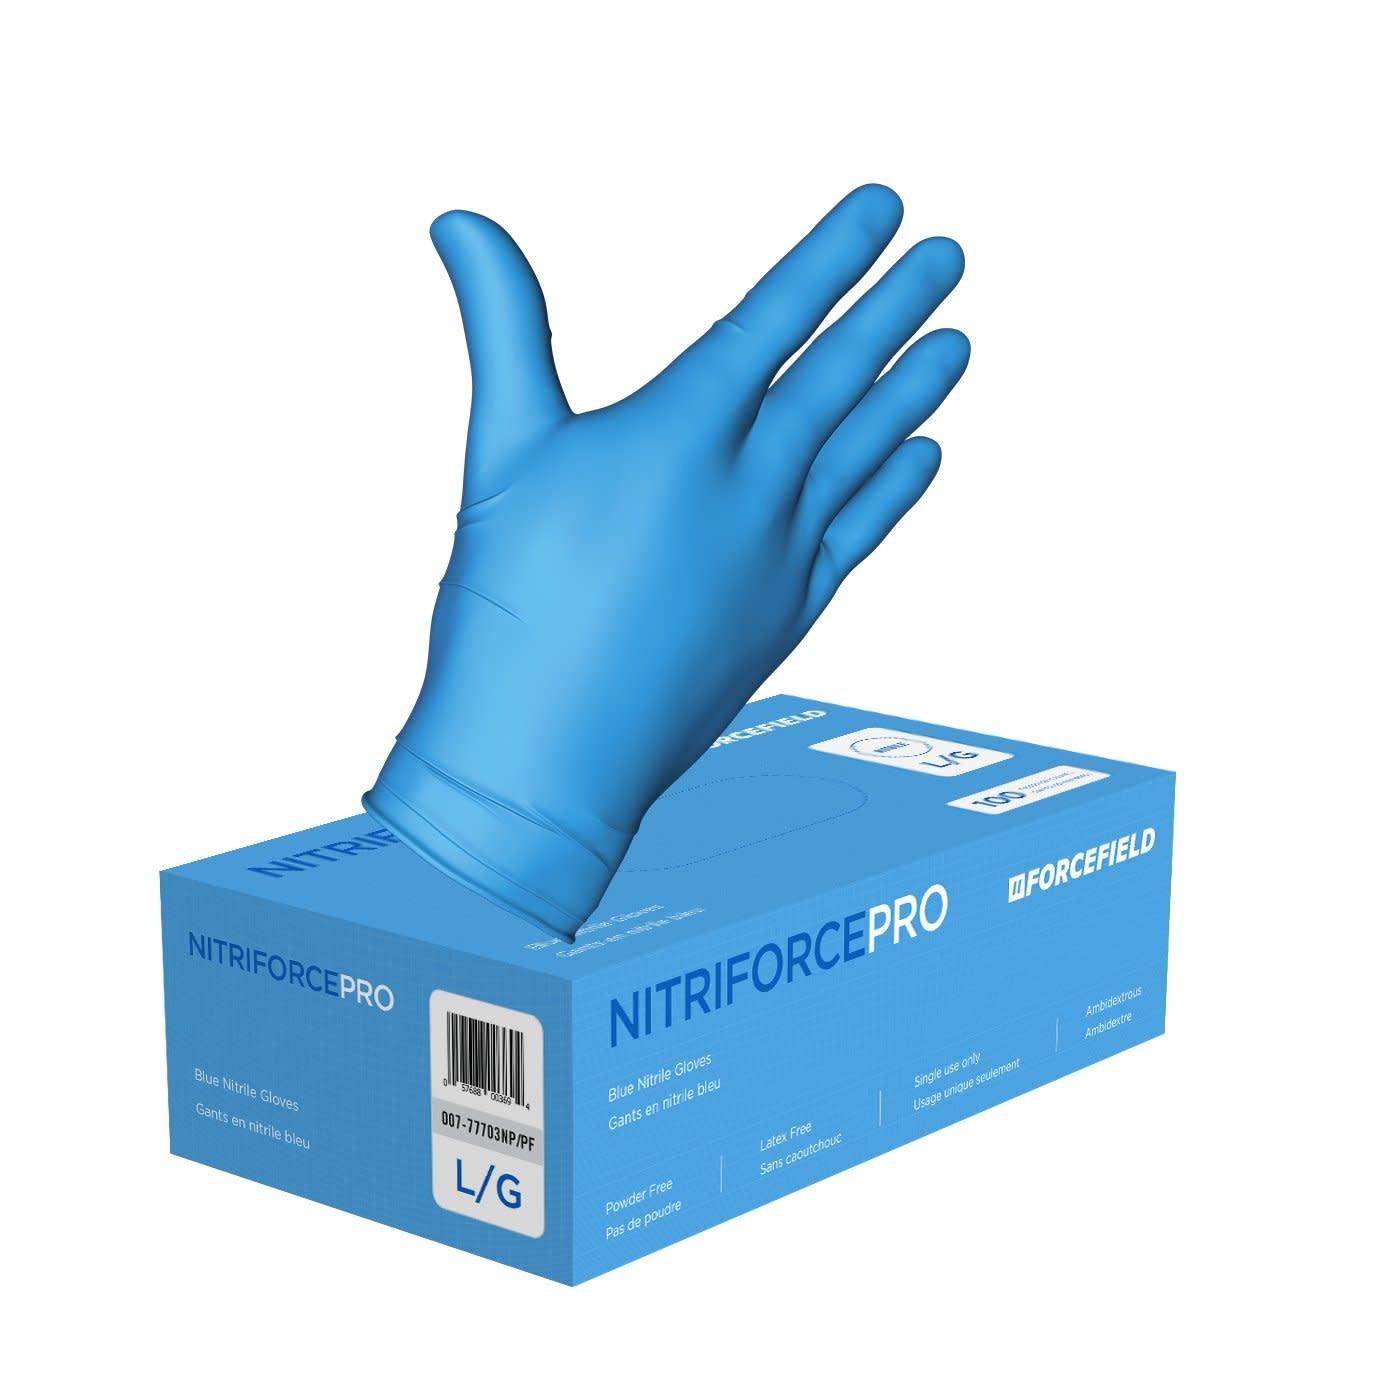 Nitriforce Pro Nitriforce - Blue Nitrile Gloves